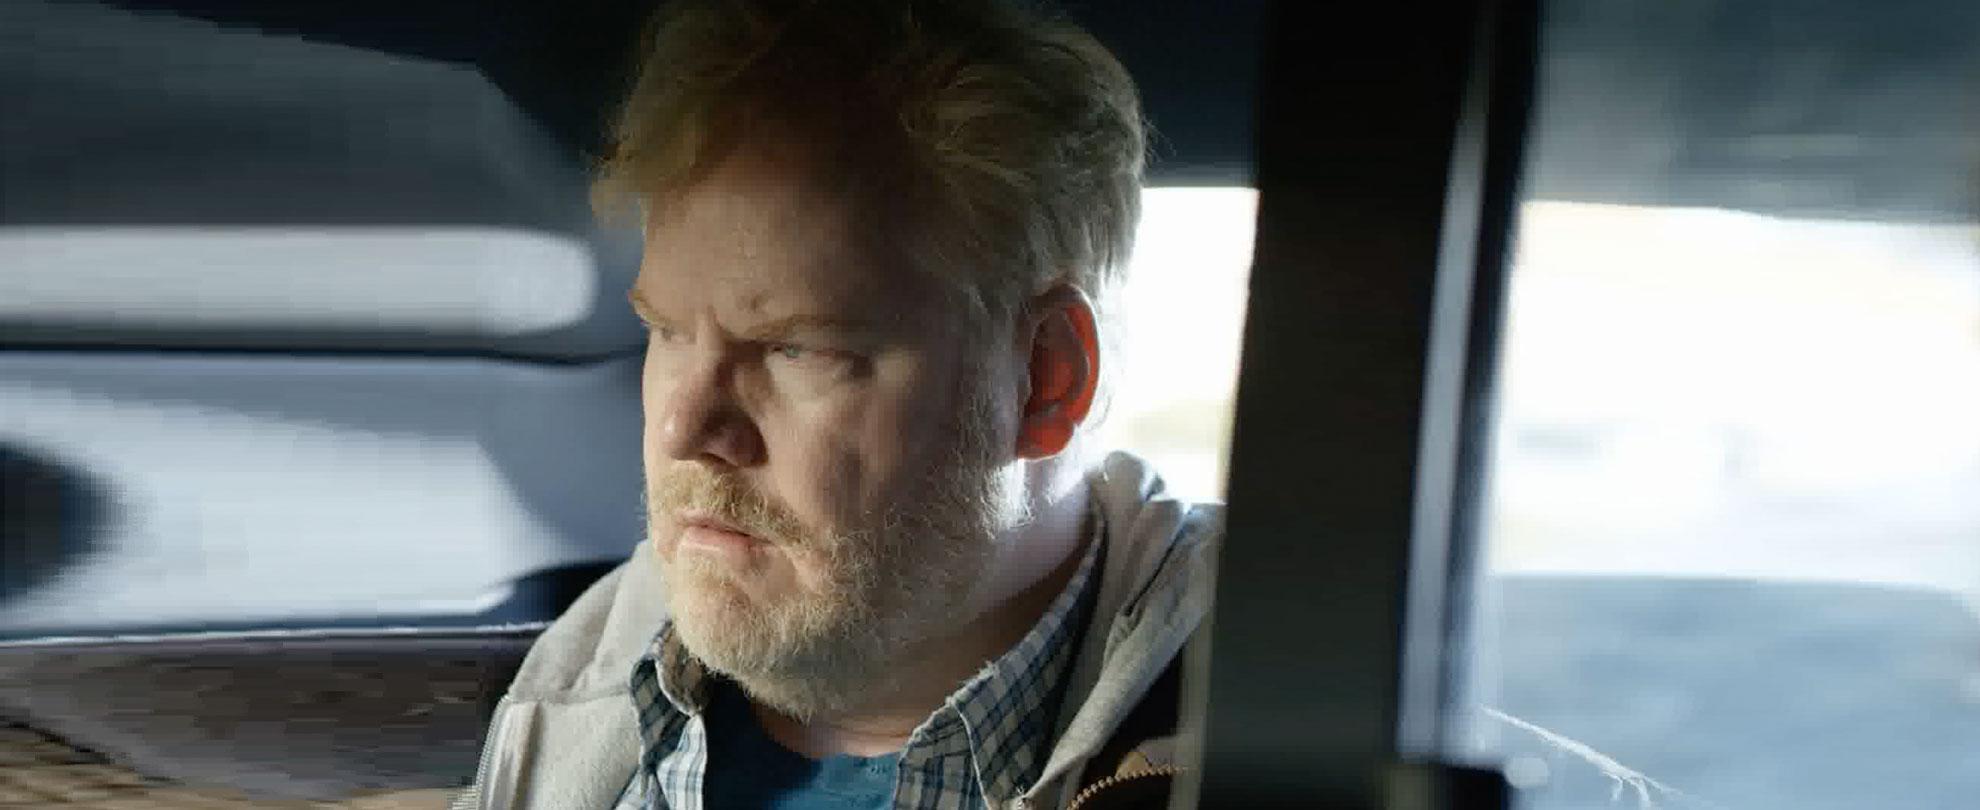 "Saban Films Acquires Derrick Borte's Dark Thriller""American Dreamer"" Starring Jim Gaffigan"